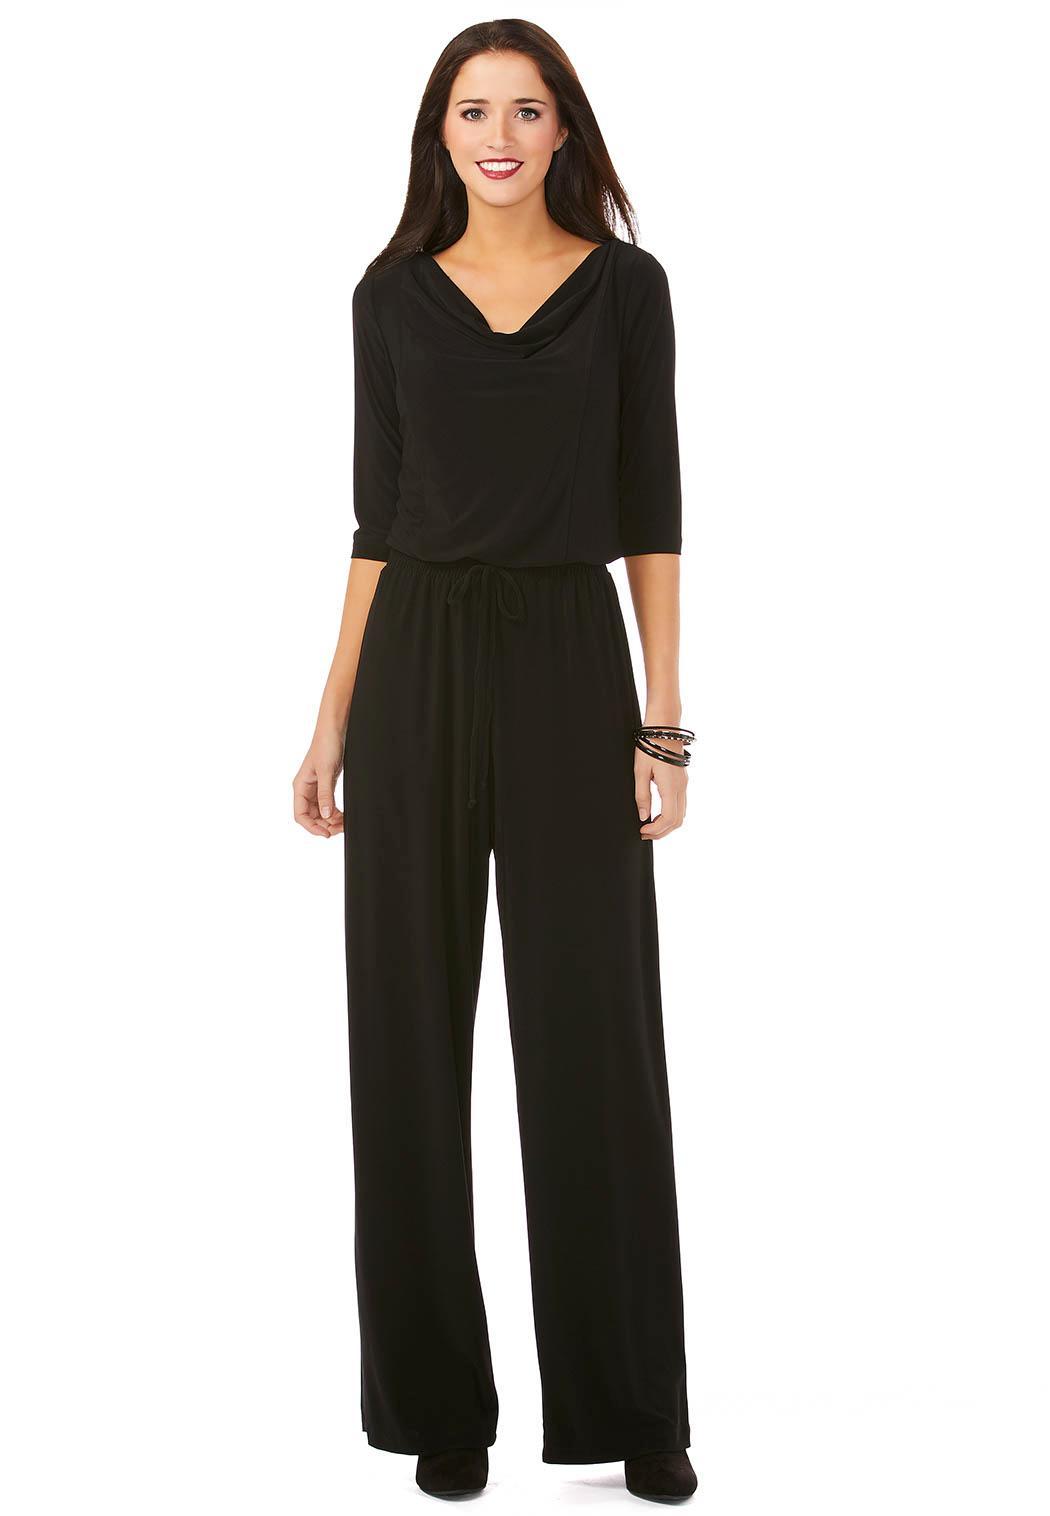 Catofashions.com Dresses Cato Fashions Round Toe